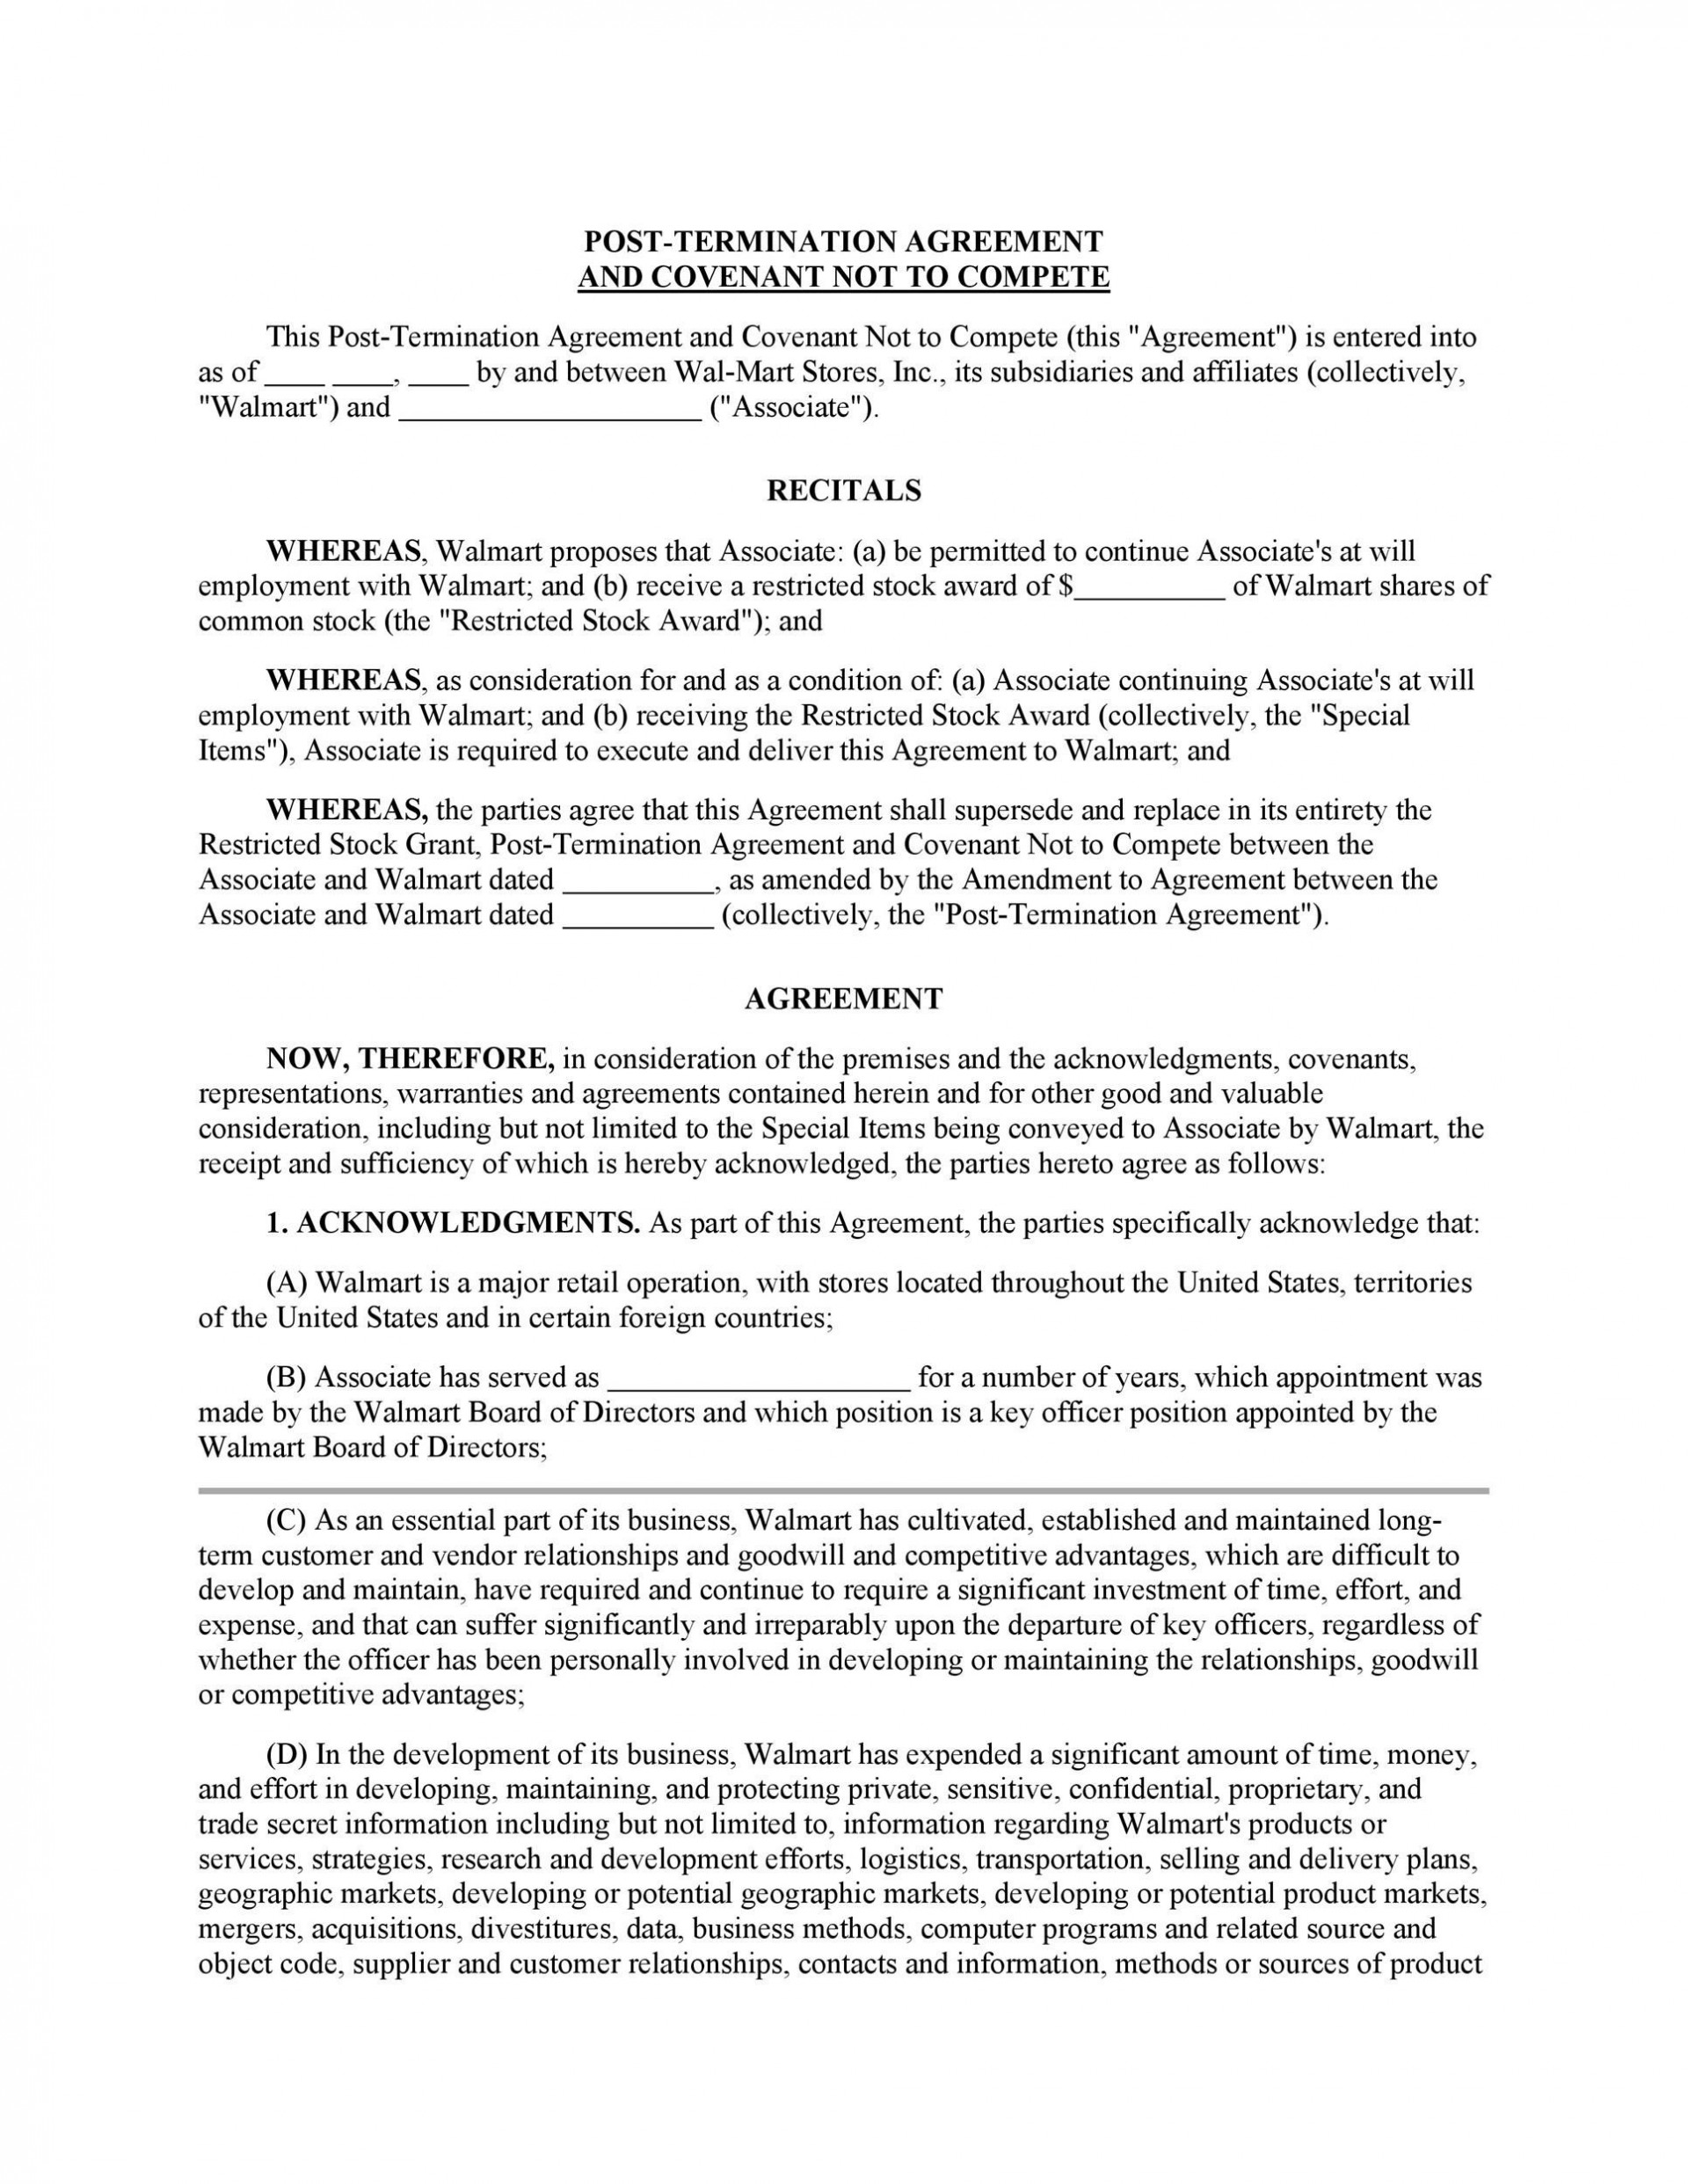 007 Amazing Non Compete Agreement Template Word Image  Microsoft Non-compete Free1920